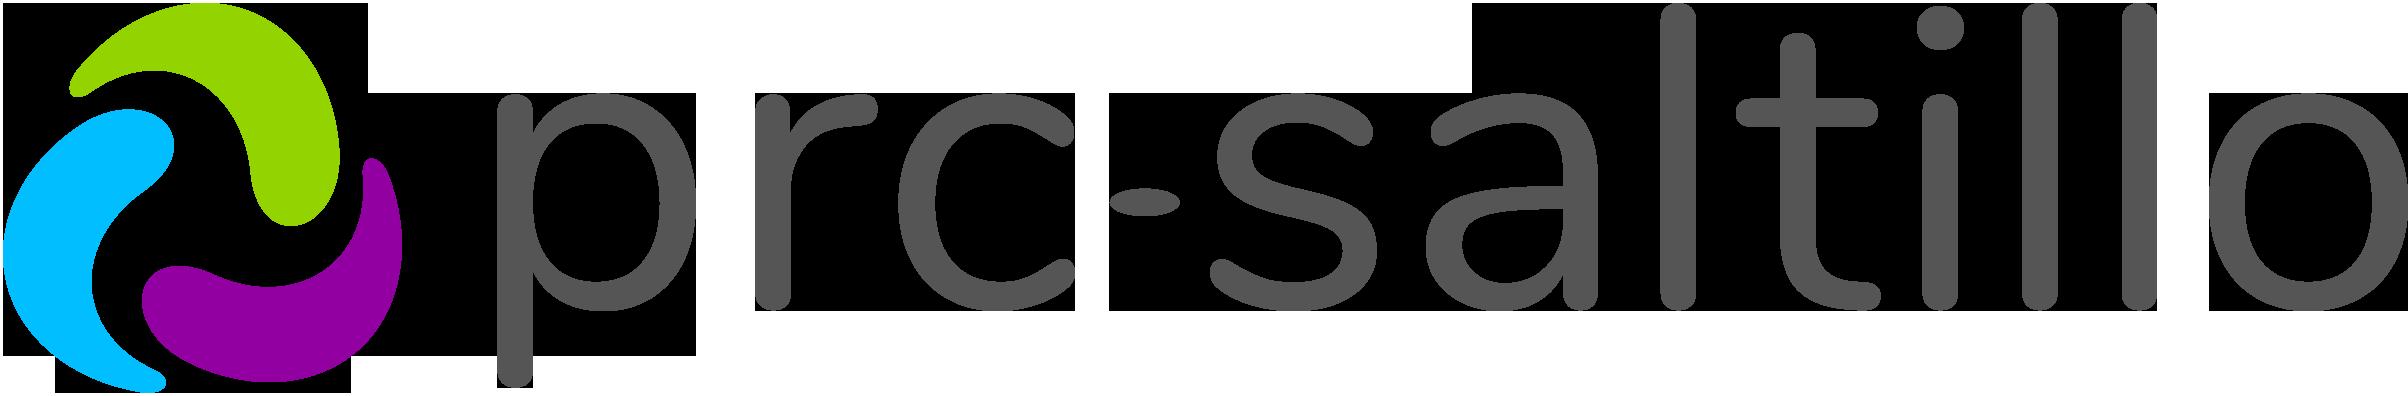 prc-saltillo's logo.